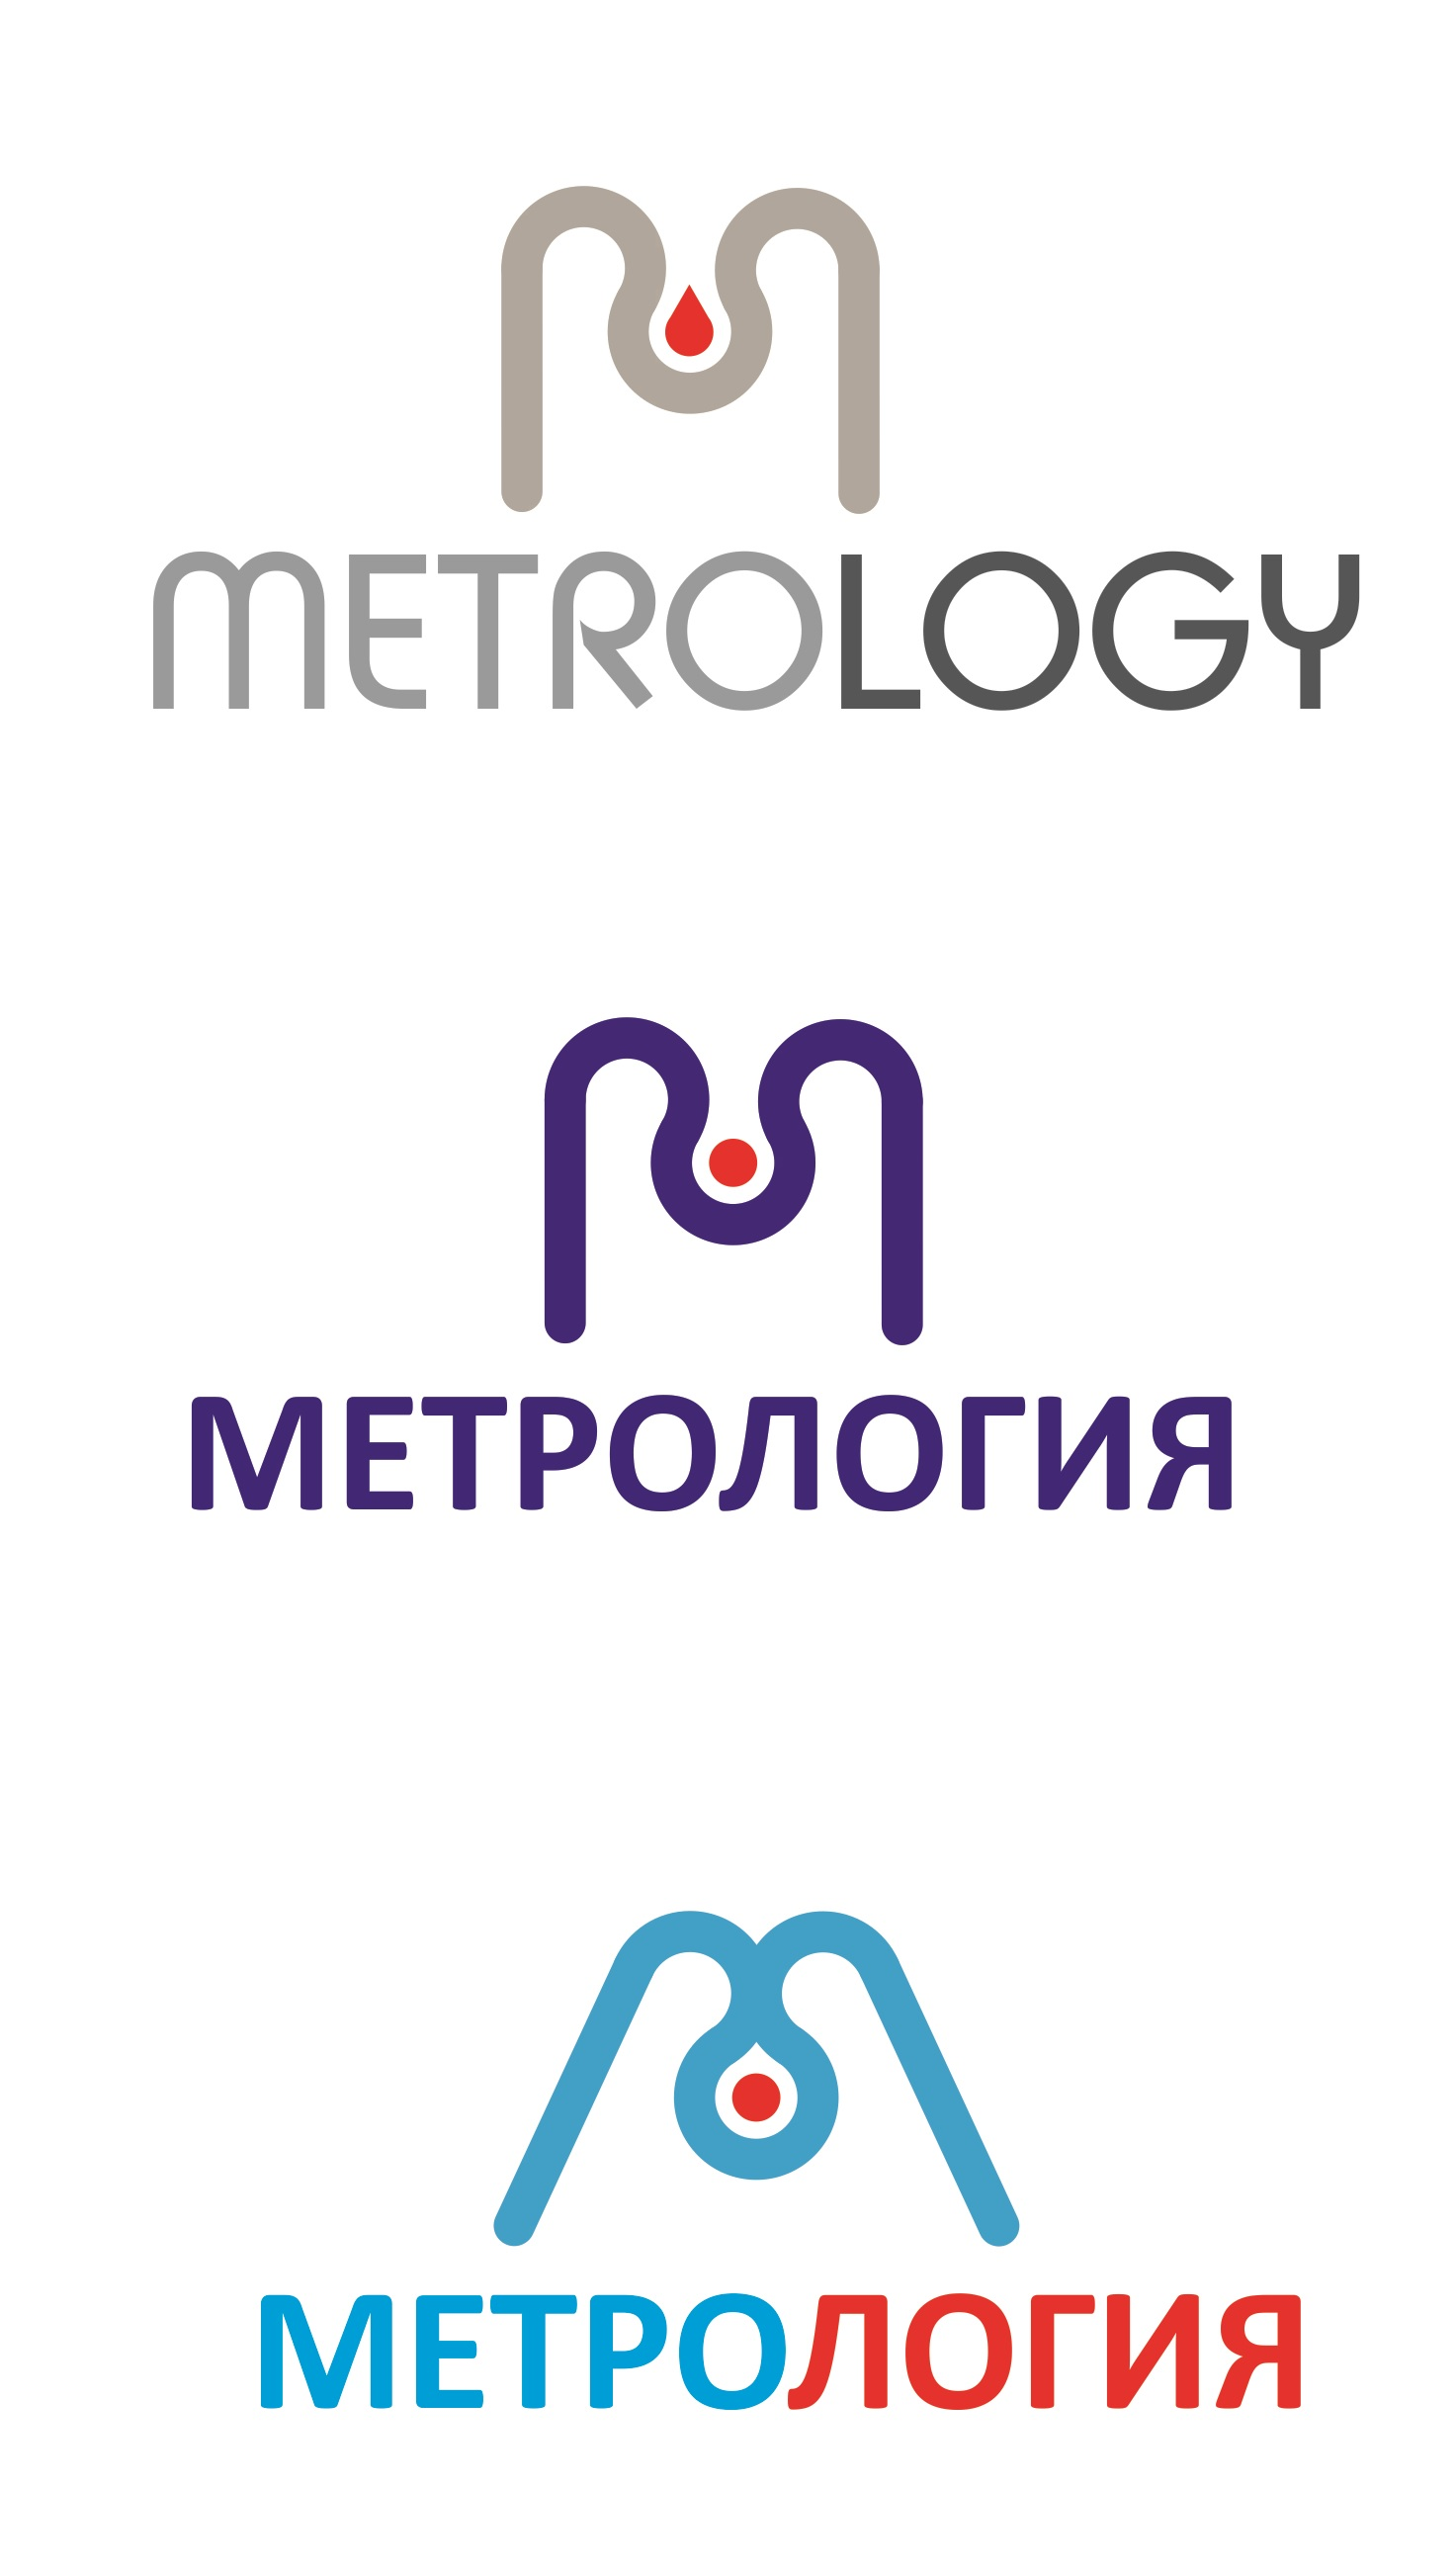 Разработать логотип, визитку, фирменный бланк. фото f_68758ff28b43c0f3.jpg